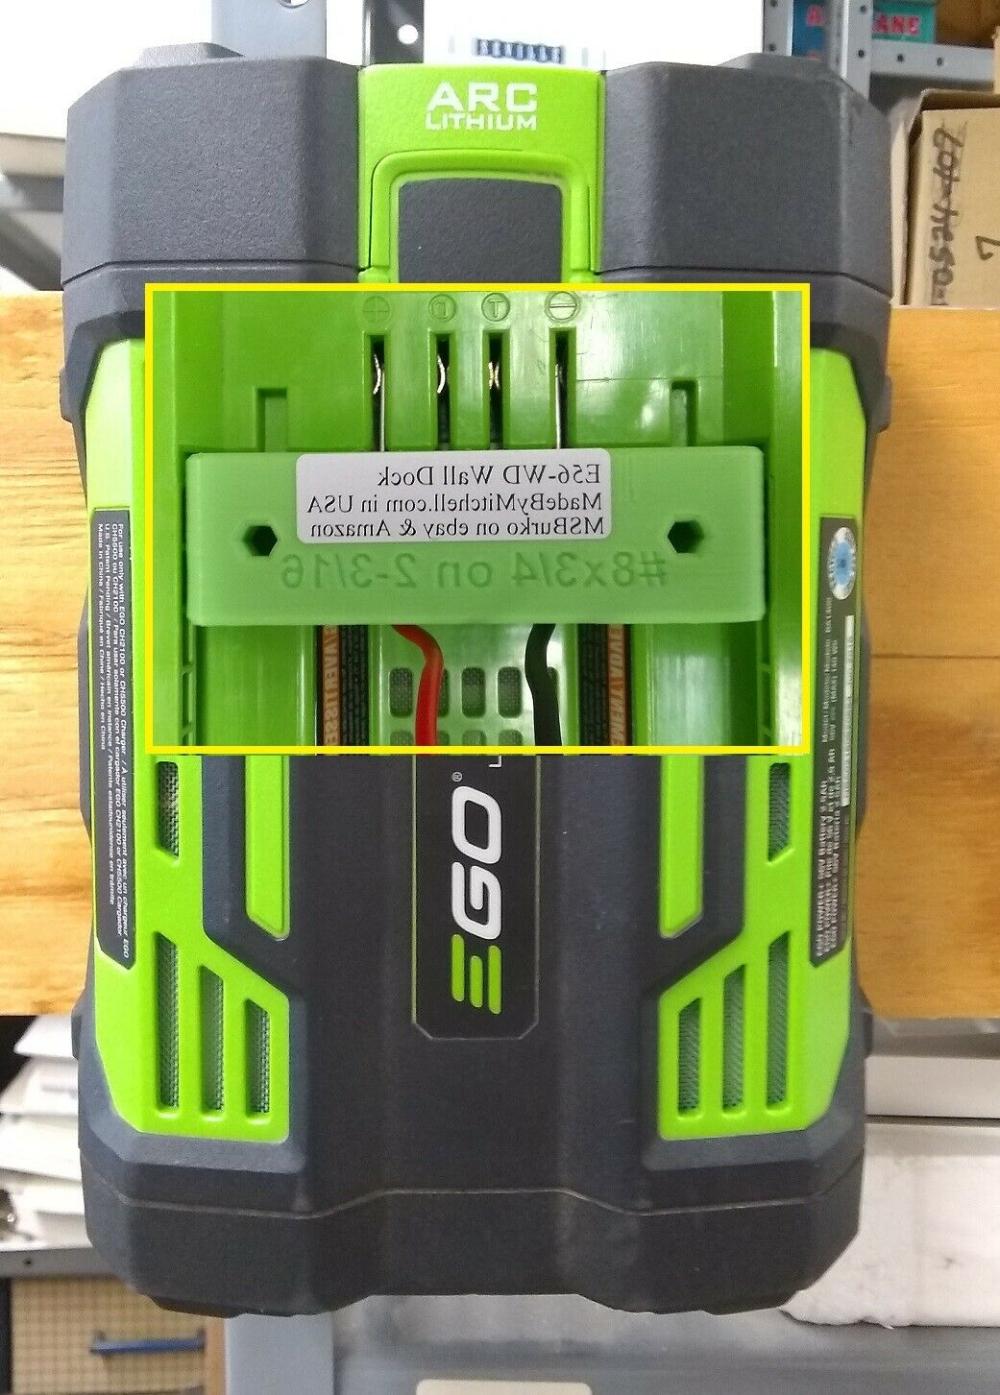 Battery Holder for EGO 56V Lawn Garden Wall Mount Store Batteries USA E56-WDx2